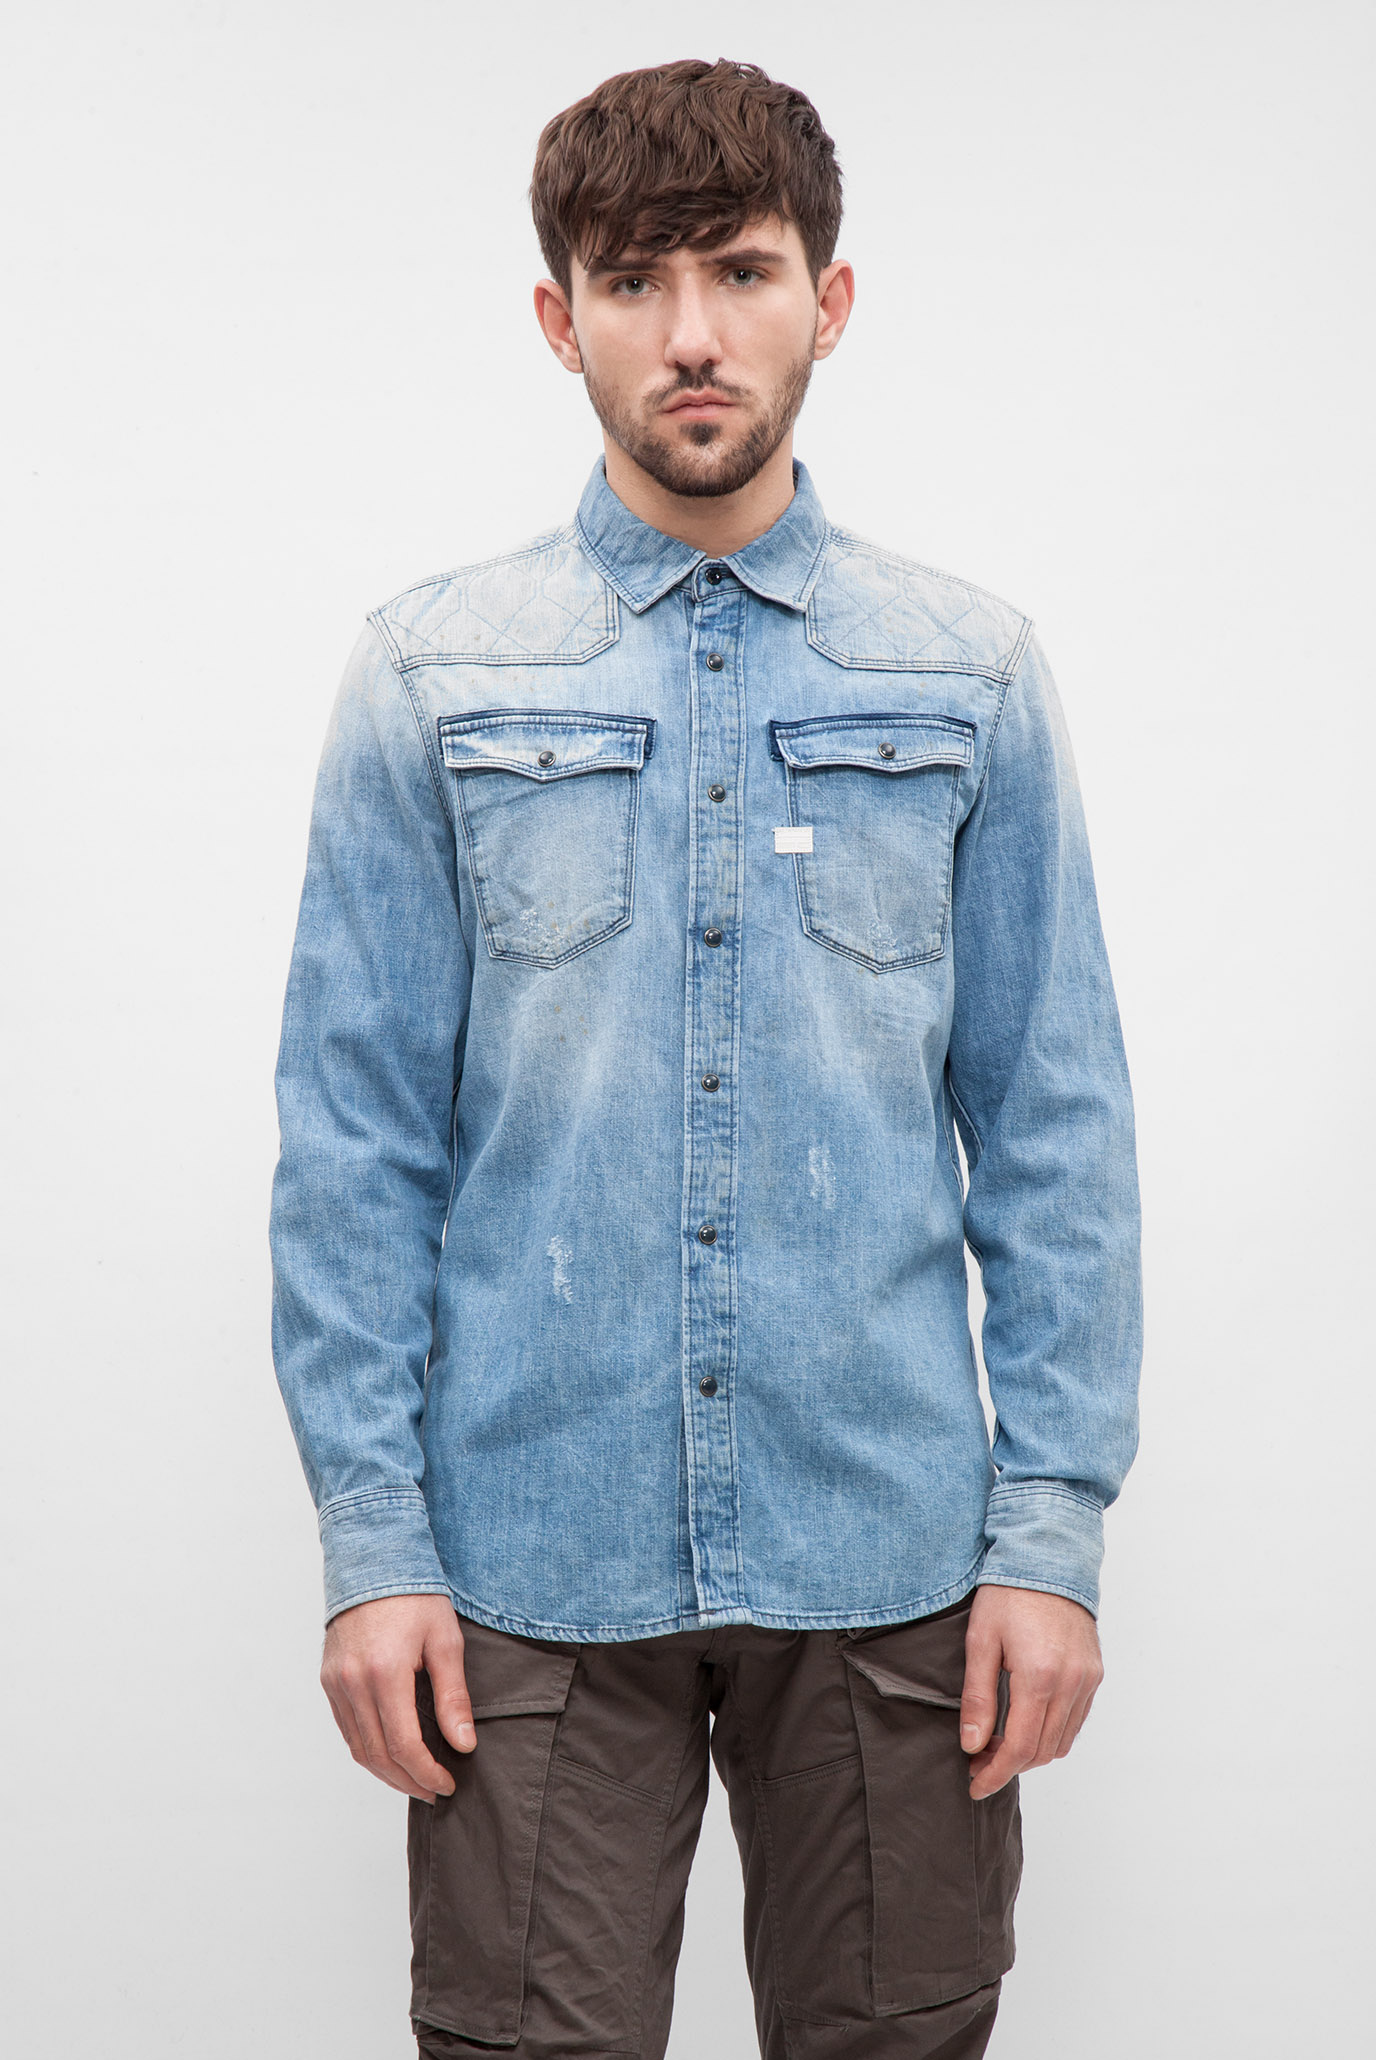 c111407ae82 Купить Мужская голубая джинсовая рубашка G-Star RAW G-Star RAW D05469